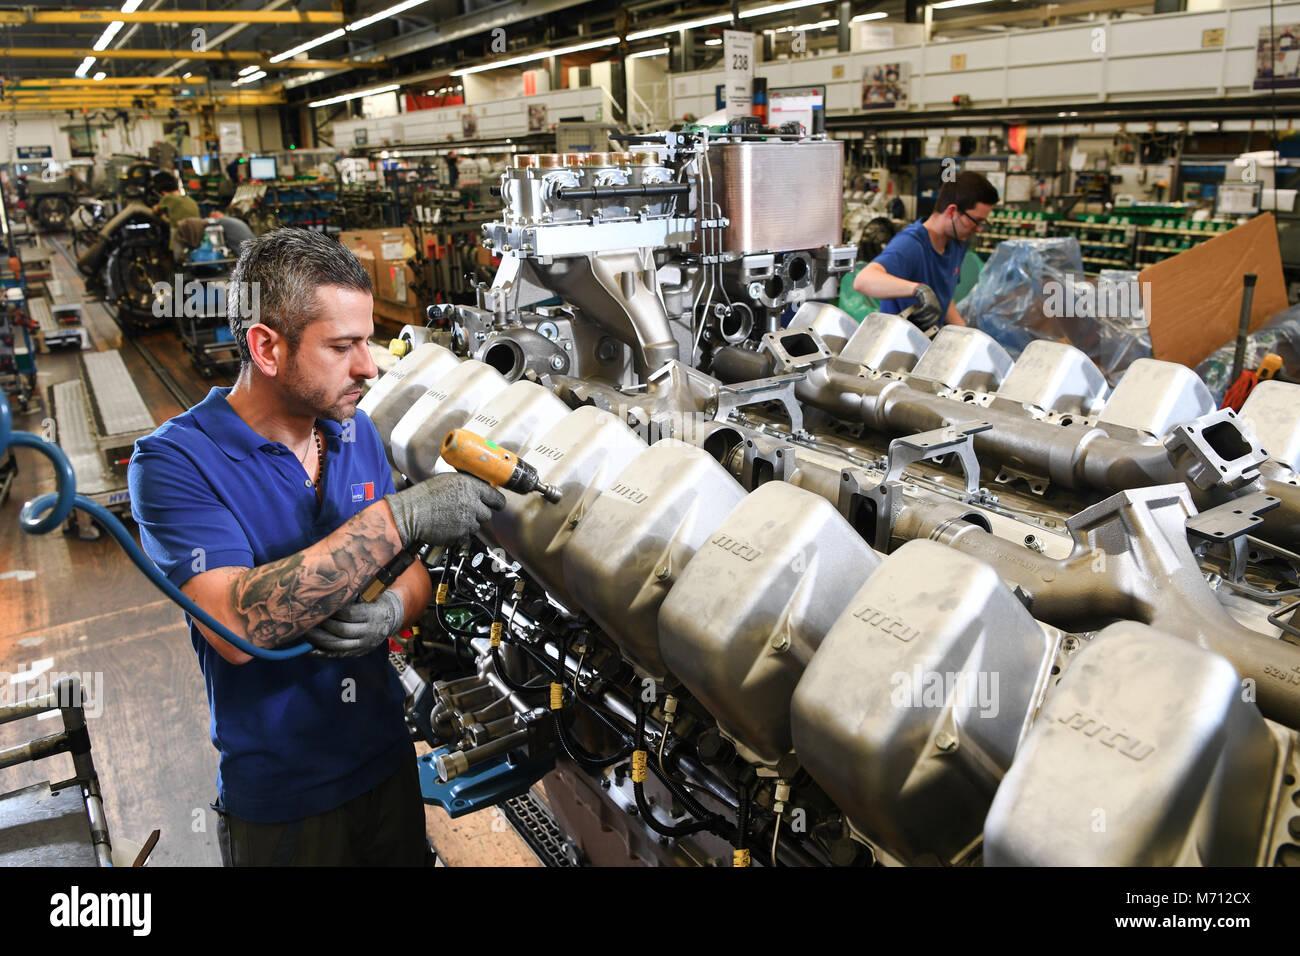 Mtu Engine Stock Photos & Mtu Engine Stock Images - Page 2